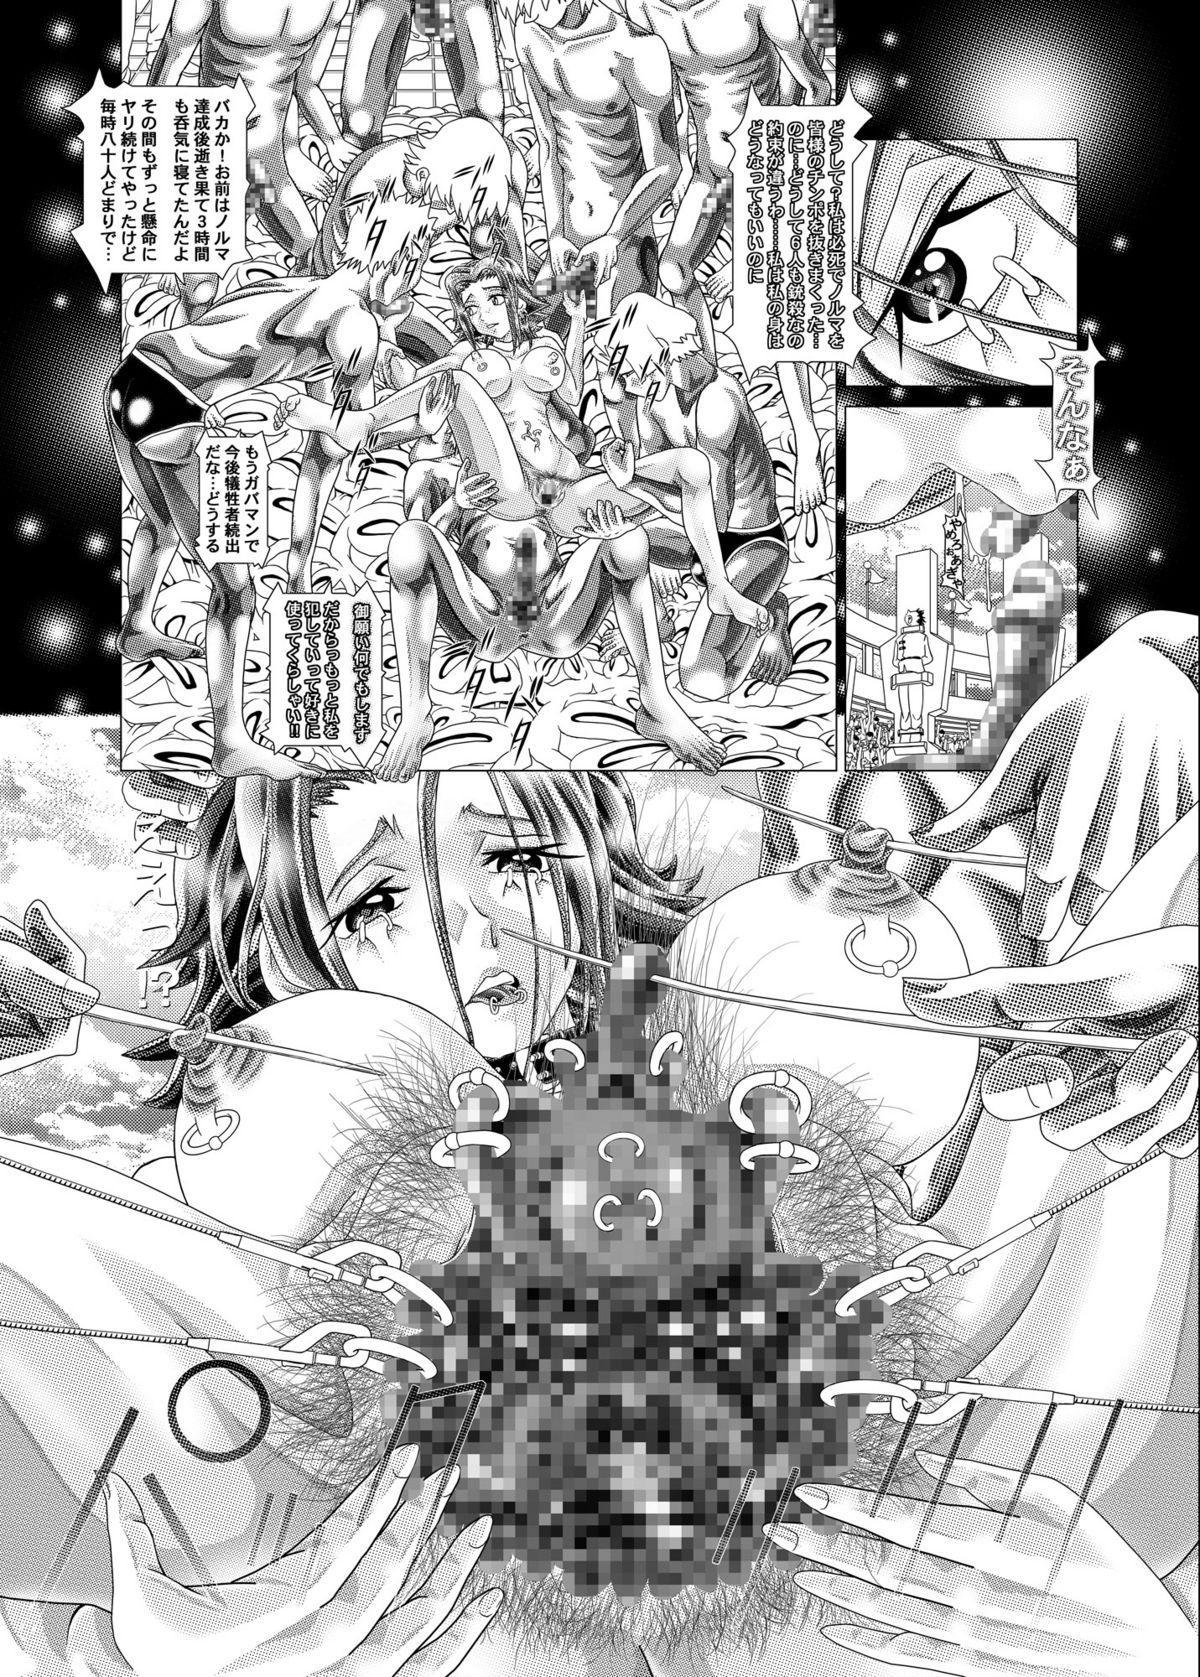 [Kaki no Boo (Kakinomoto Utamaro)] Karen - R22 of the Cord Eros - Infringement (Code Geass) [Digital] 14